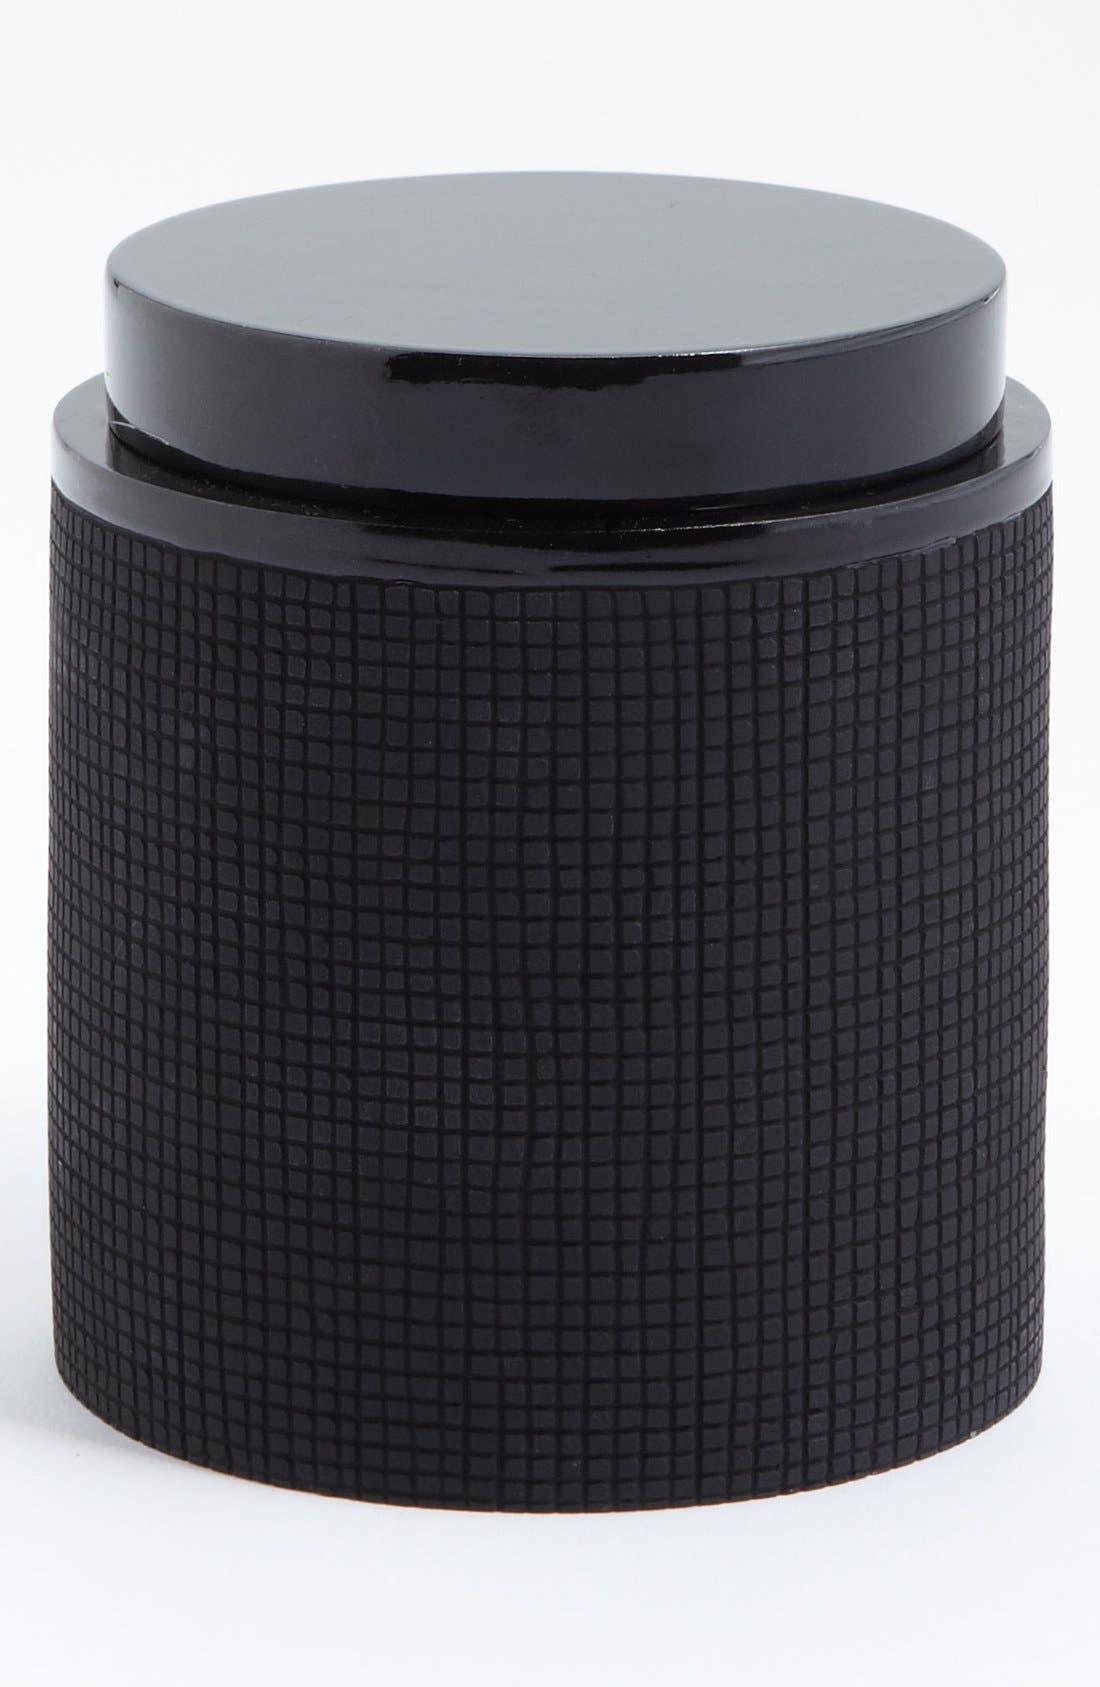 Main Image - Waterworks Studio 'Merritt' Covered Jar (Online Only)